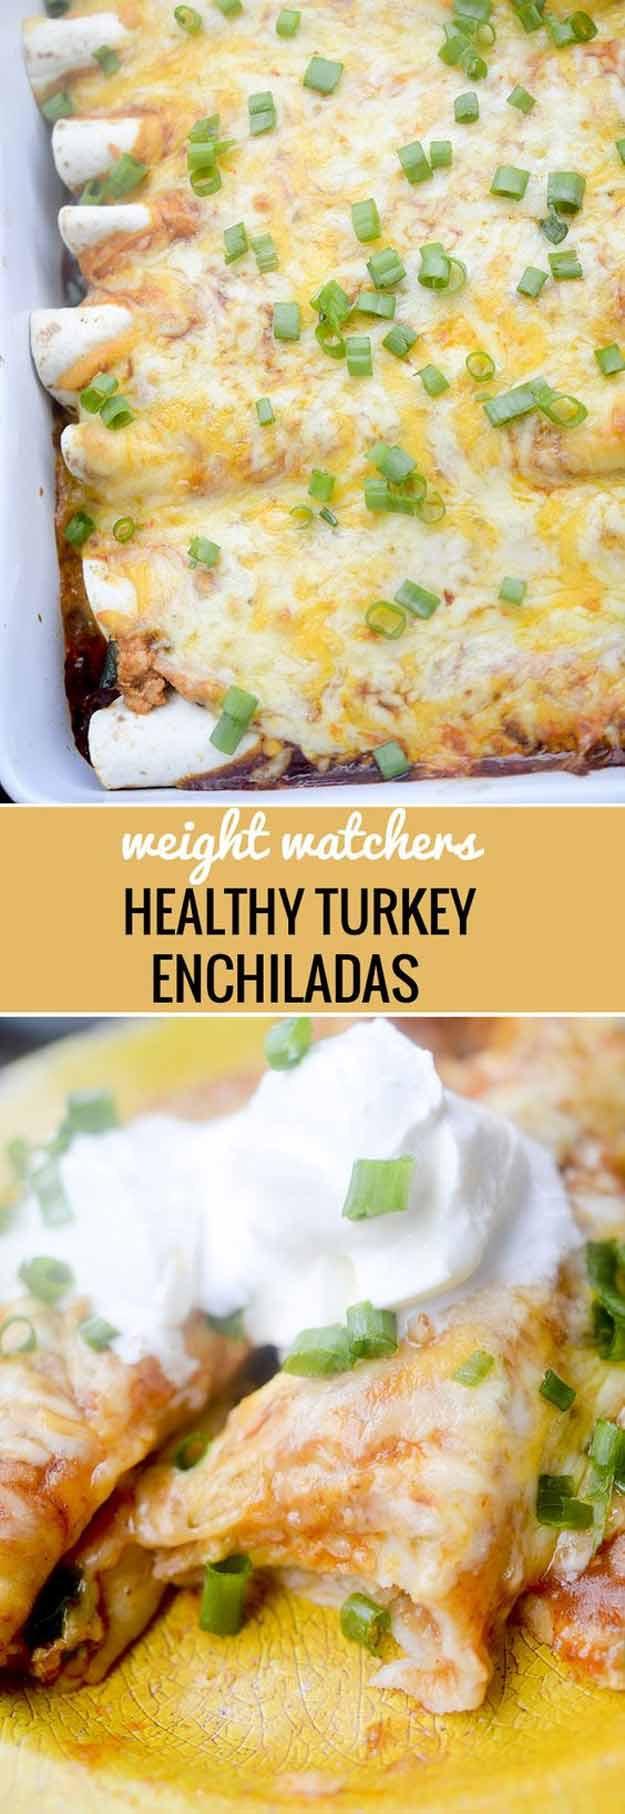 Low Fat Chicken Enchiladas Weight Watchers  38 More Healthy Dinner Recipes The Goddess